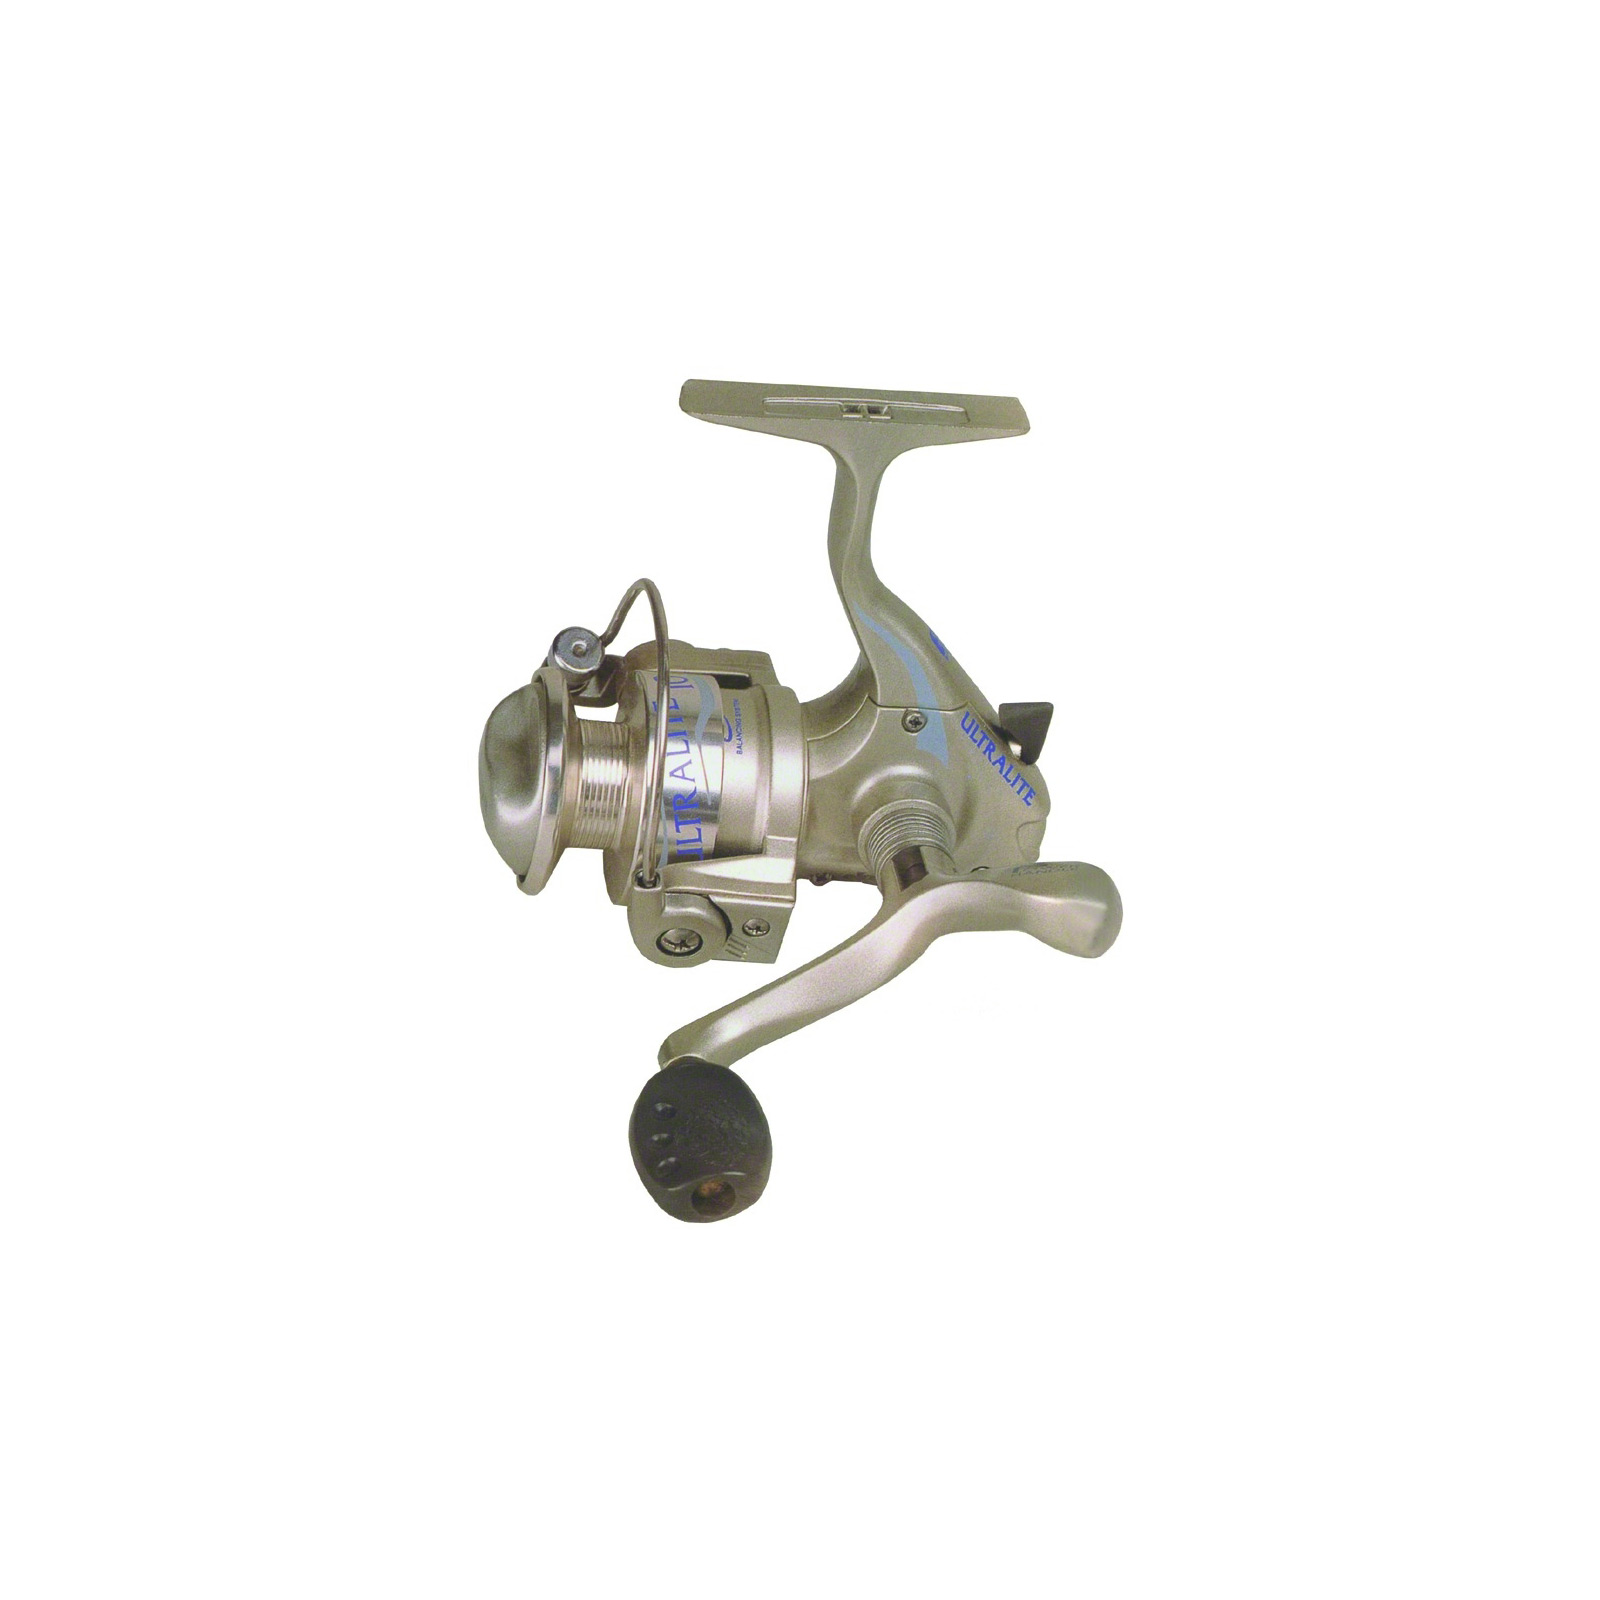 Okuma Ultralite Spinning Reel, 5.0:1, 3 Ball Bearings, 4 lbs/200 yds